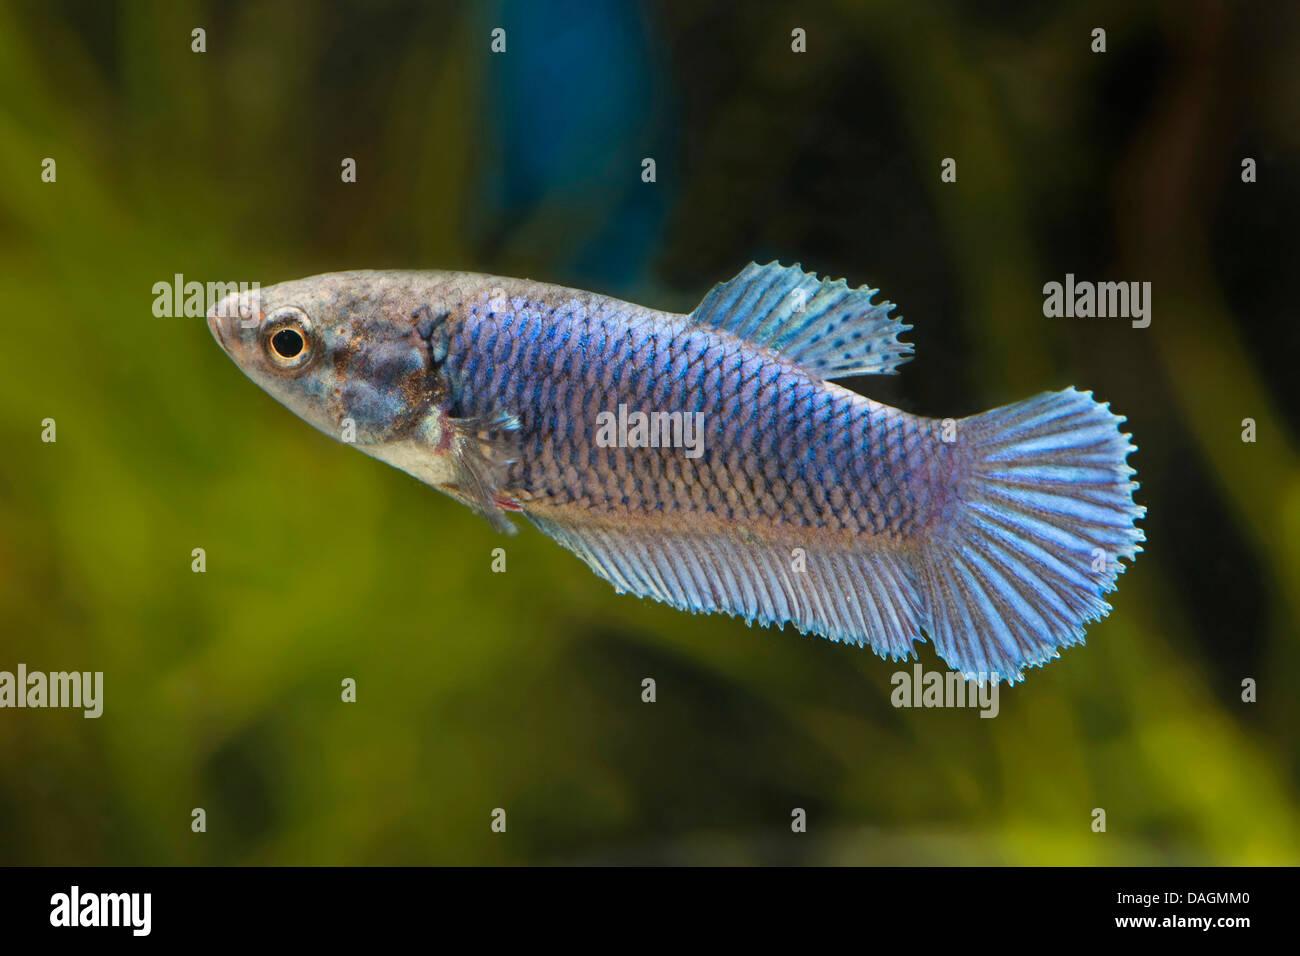 Siamese Fighting Fish Siamese Fighter Betta Splendens